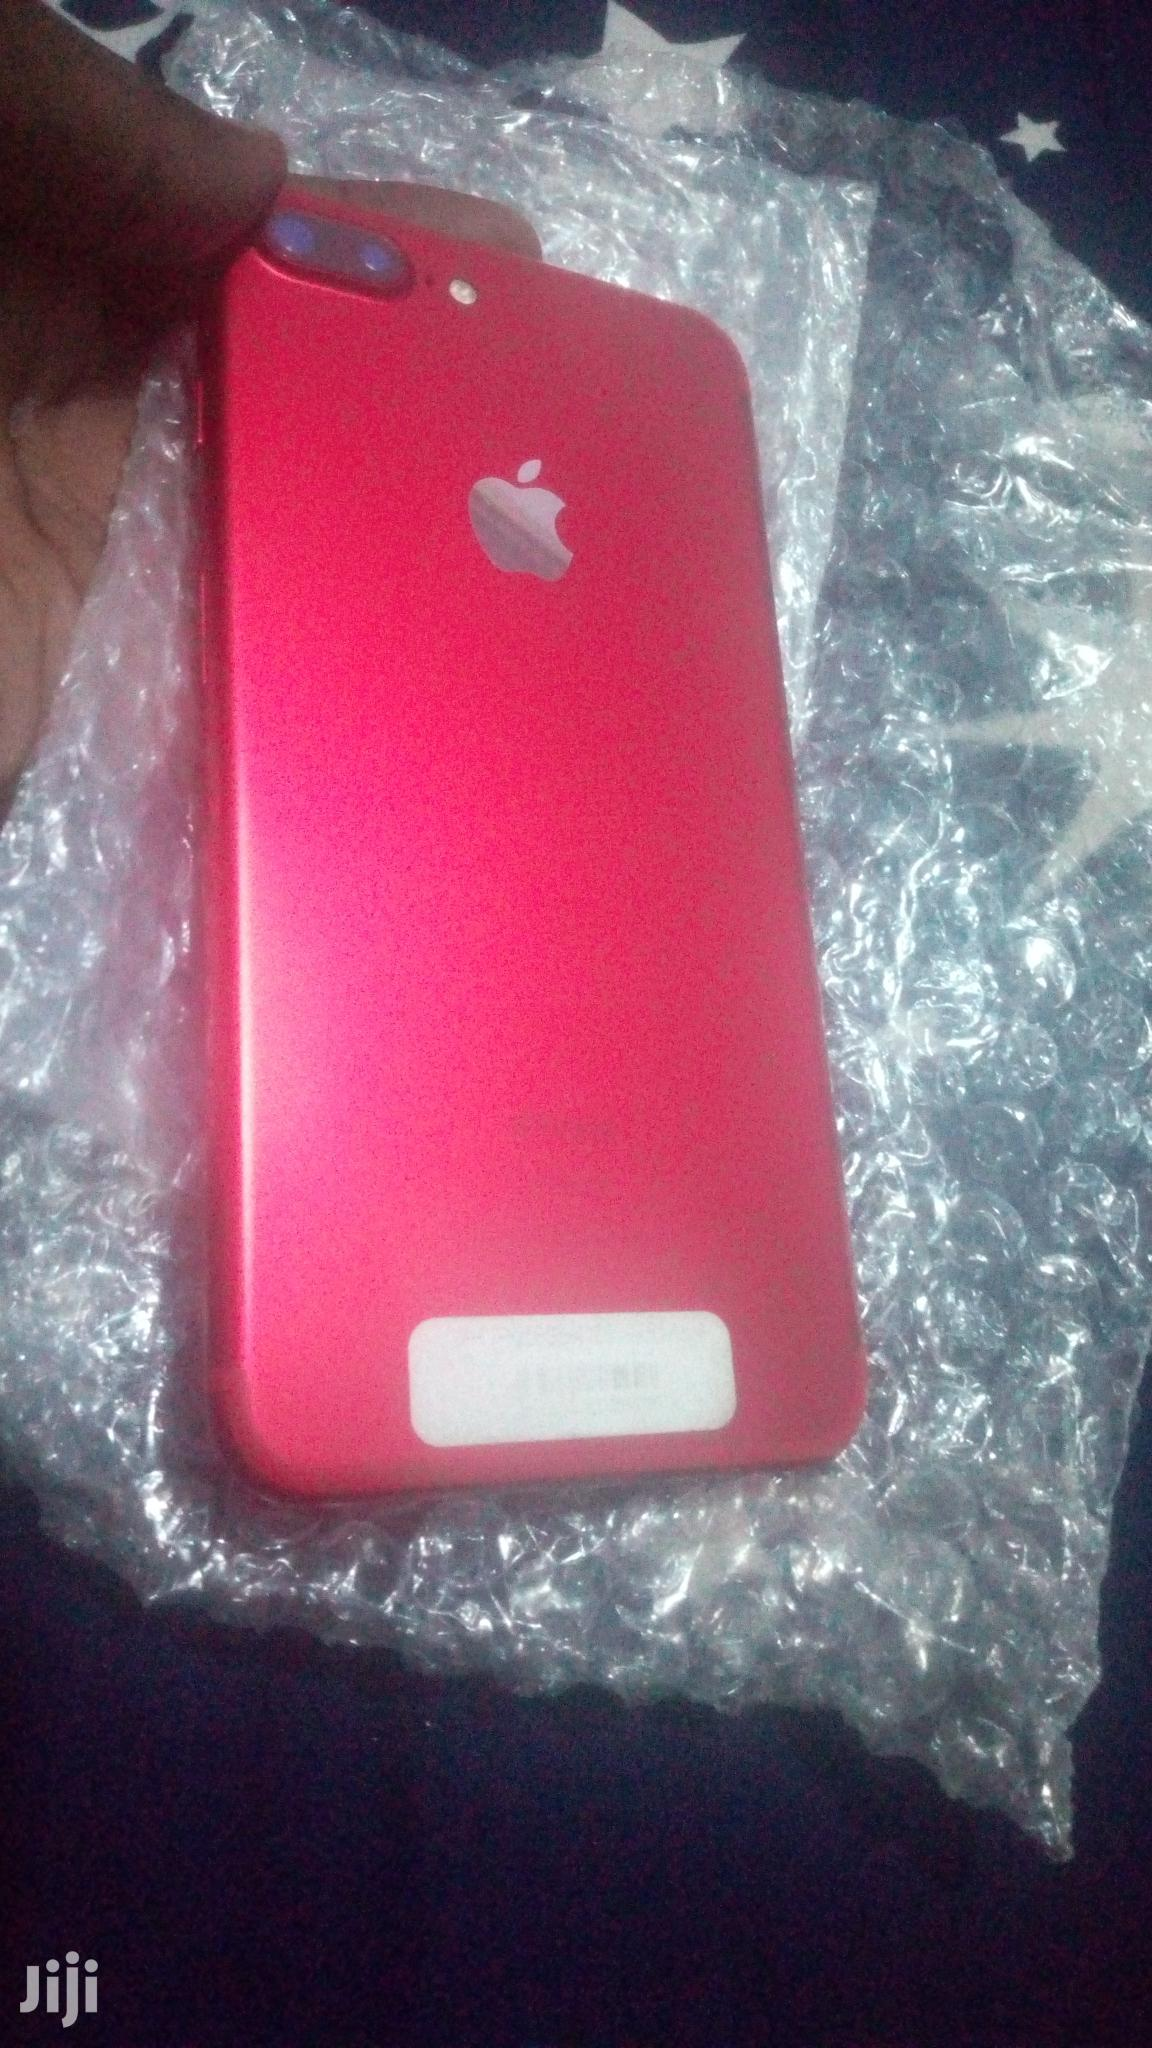 Apple iPhone 7 Plus 32 GB Red | Mobile Phones for sale in Osogbo, Osun State, Nigeria